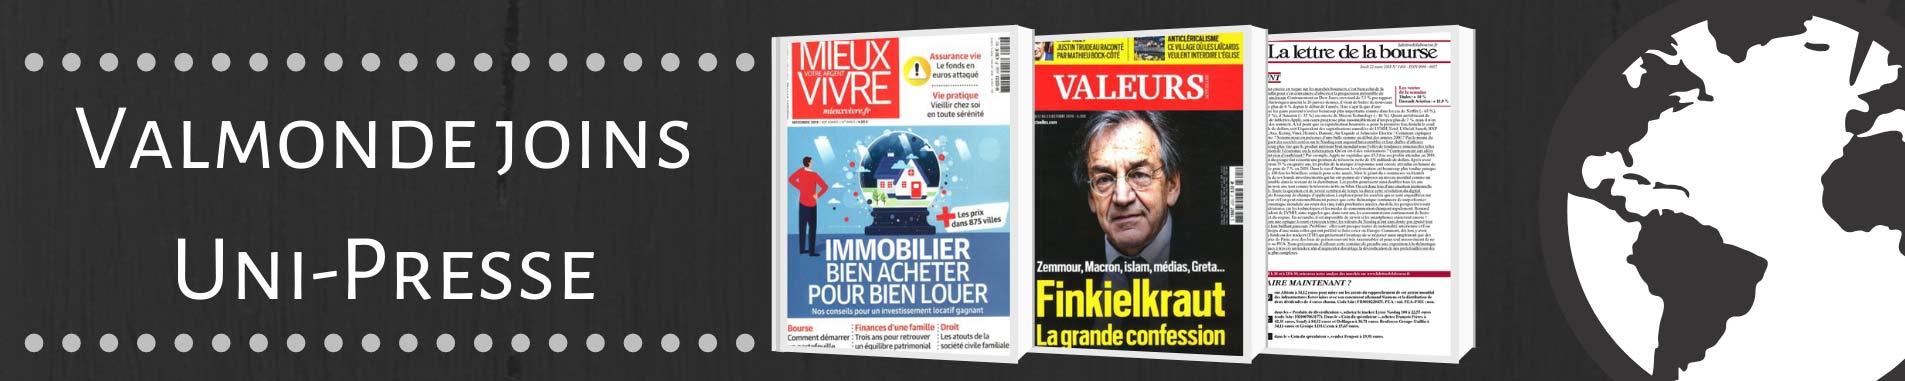 Valmonde joins UNI-Presse